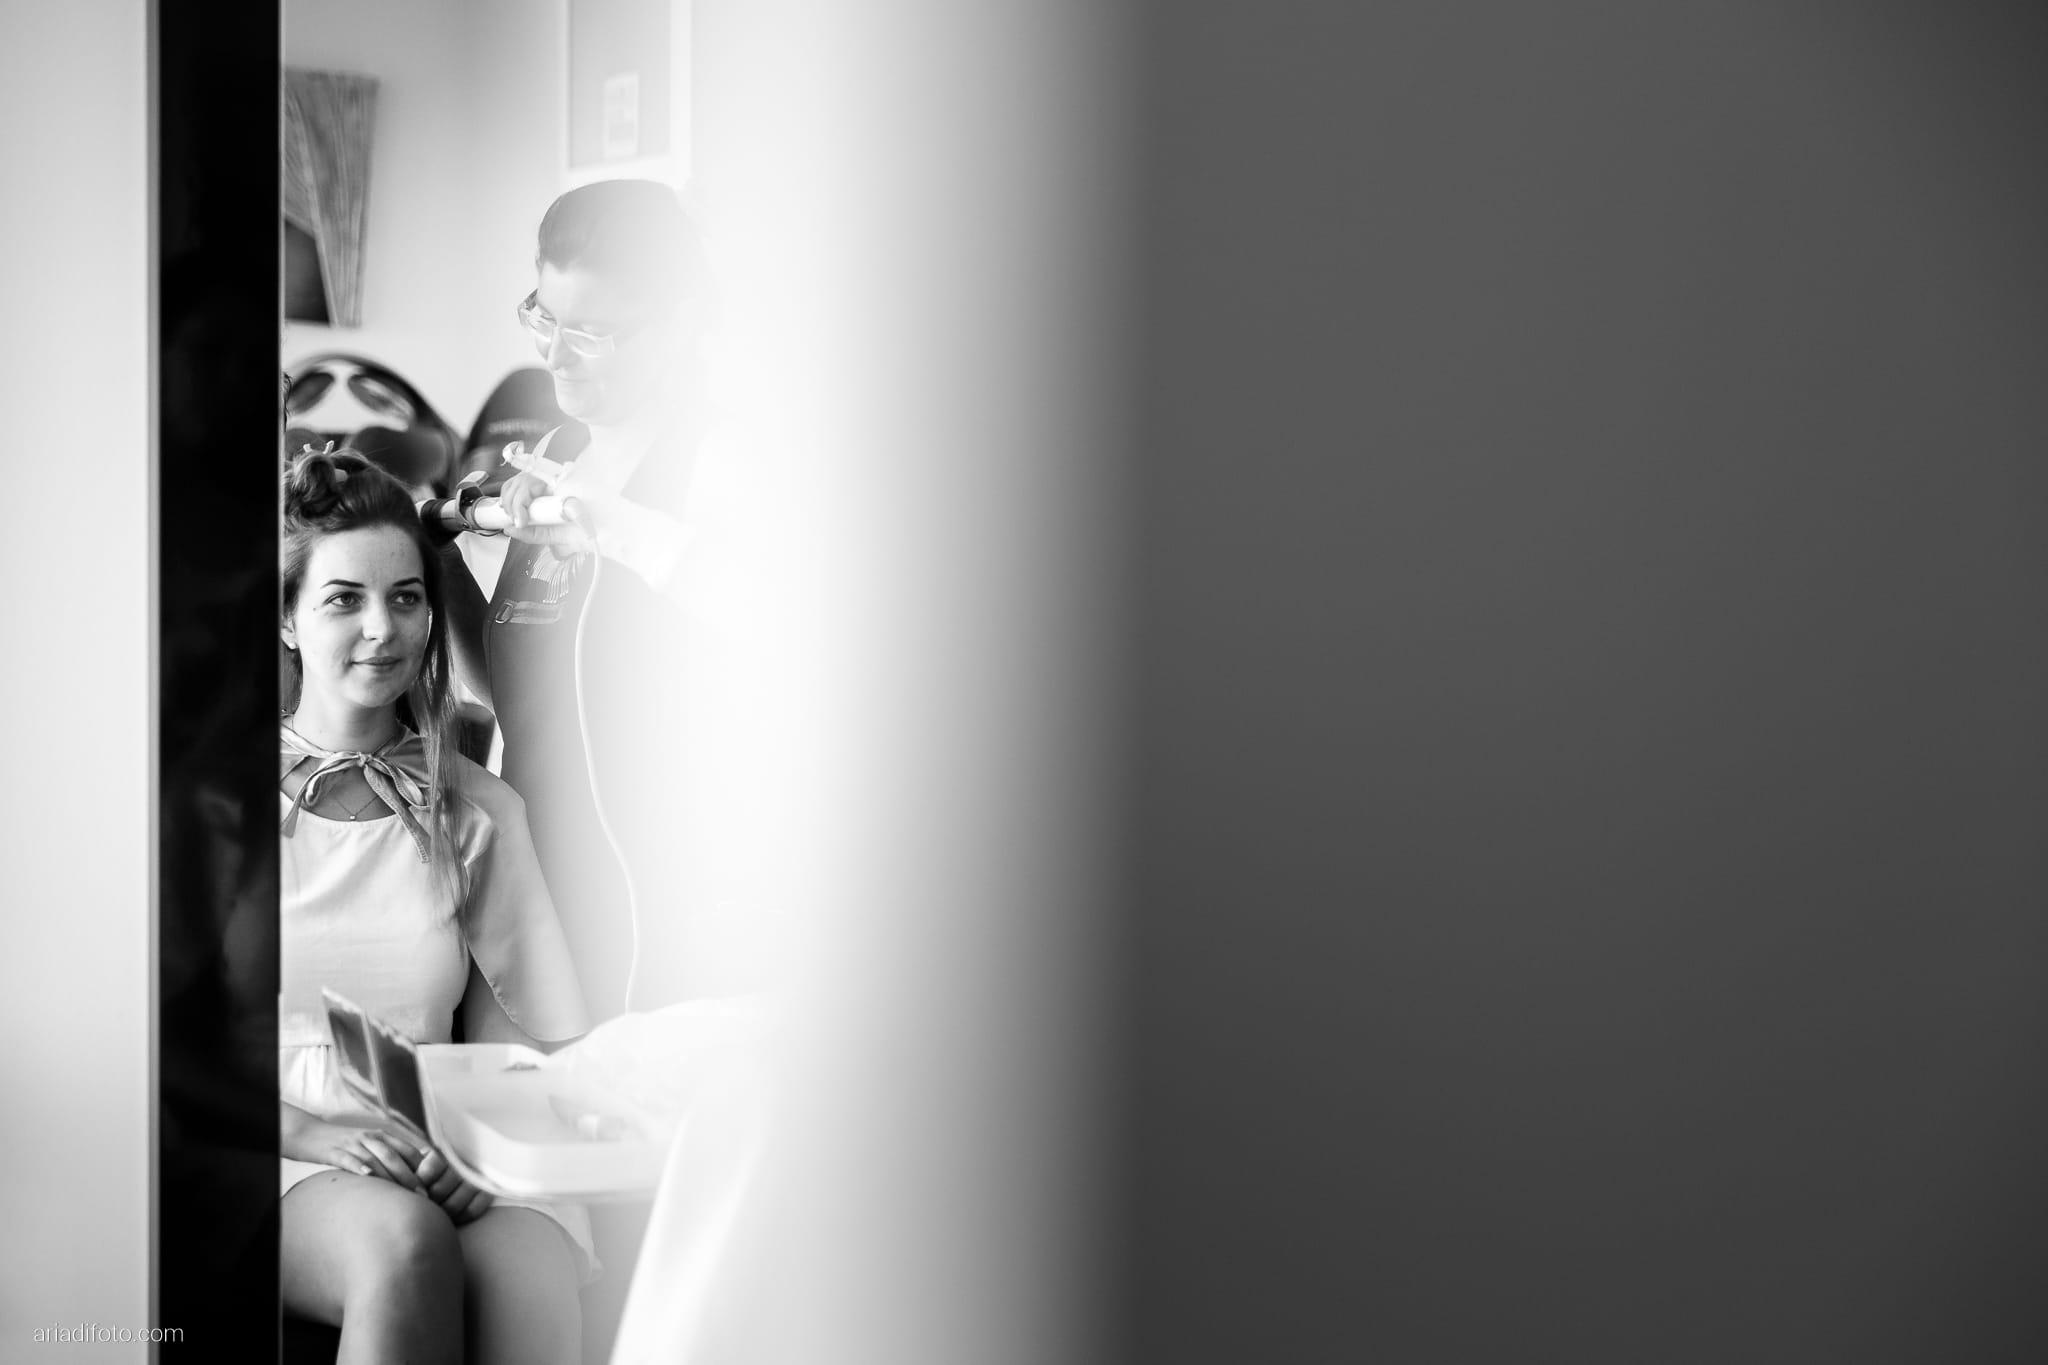 Valentina Francesco Matrimonio Pagnacco Castello Villalta Fagagna Udine preparativi acconciatura specchio riflesso